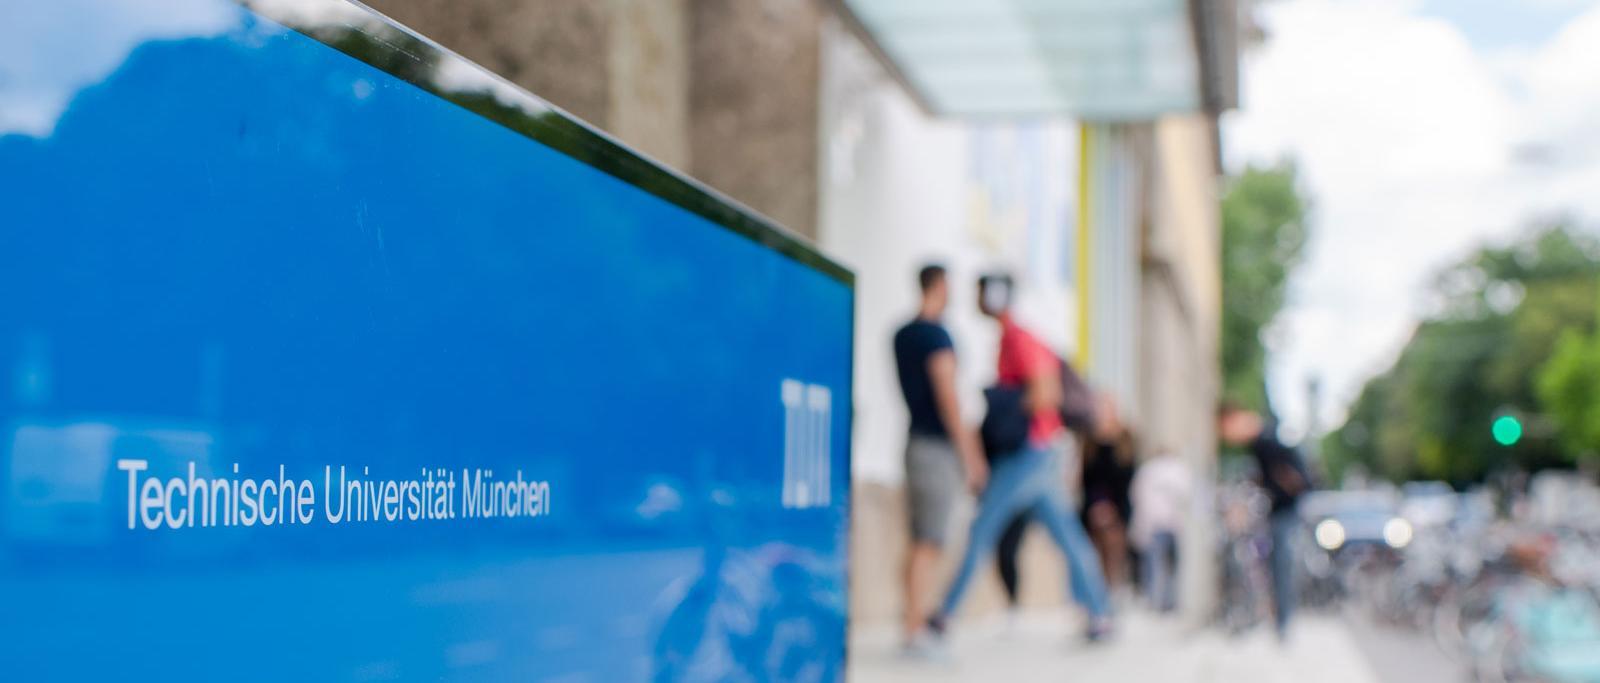 MENGENAL UNIVERSITAS TEKNIK MUNCHEN (Technische Universität München)